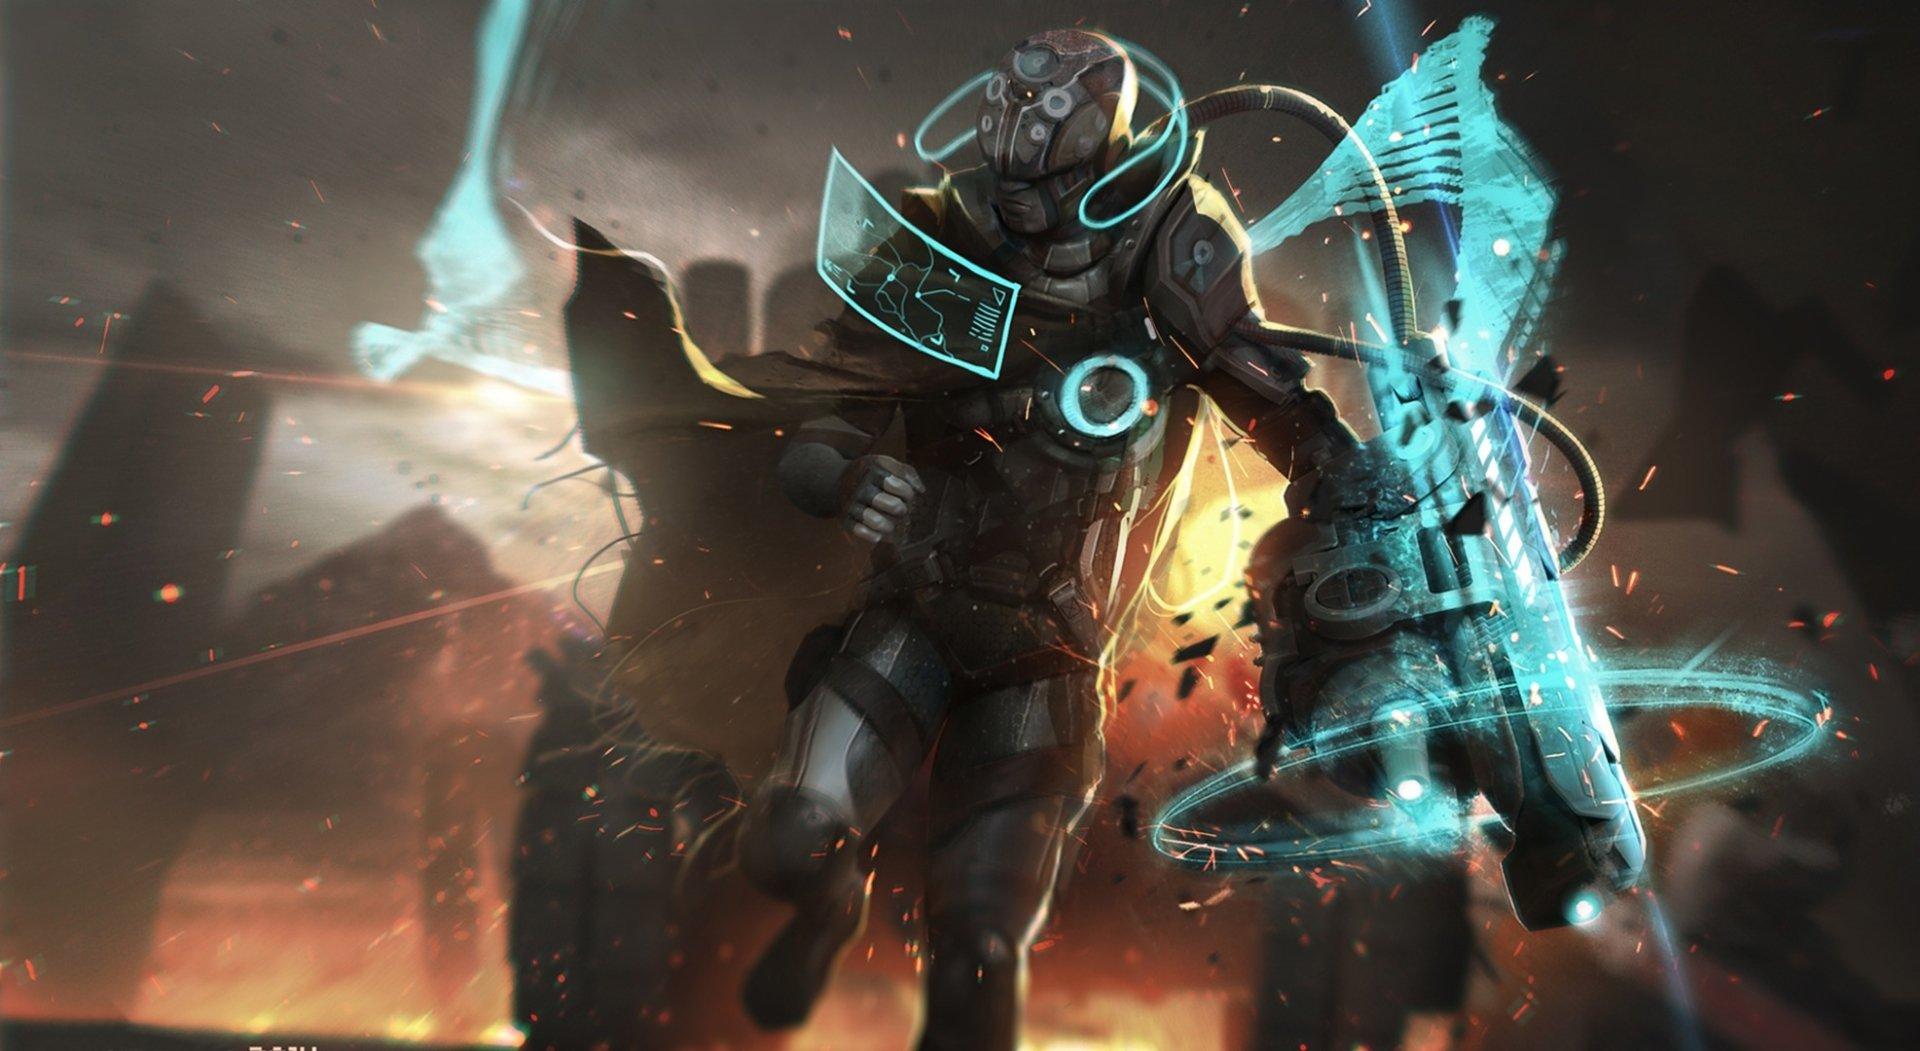 Sci Fi - Cyborg  Warrior Weapon Wallpaper